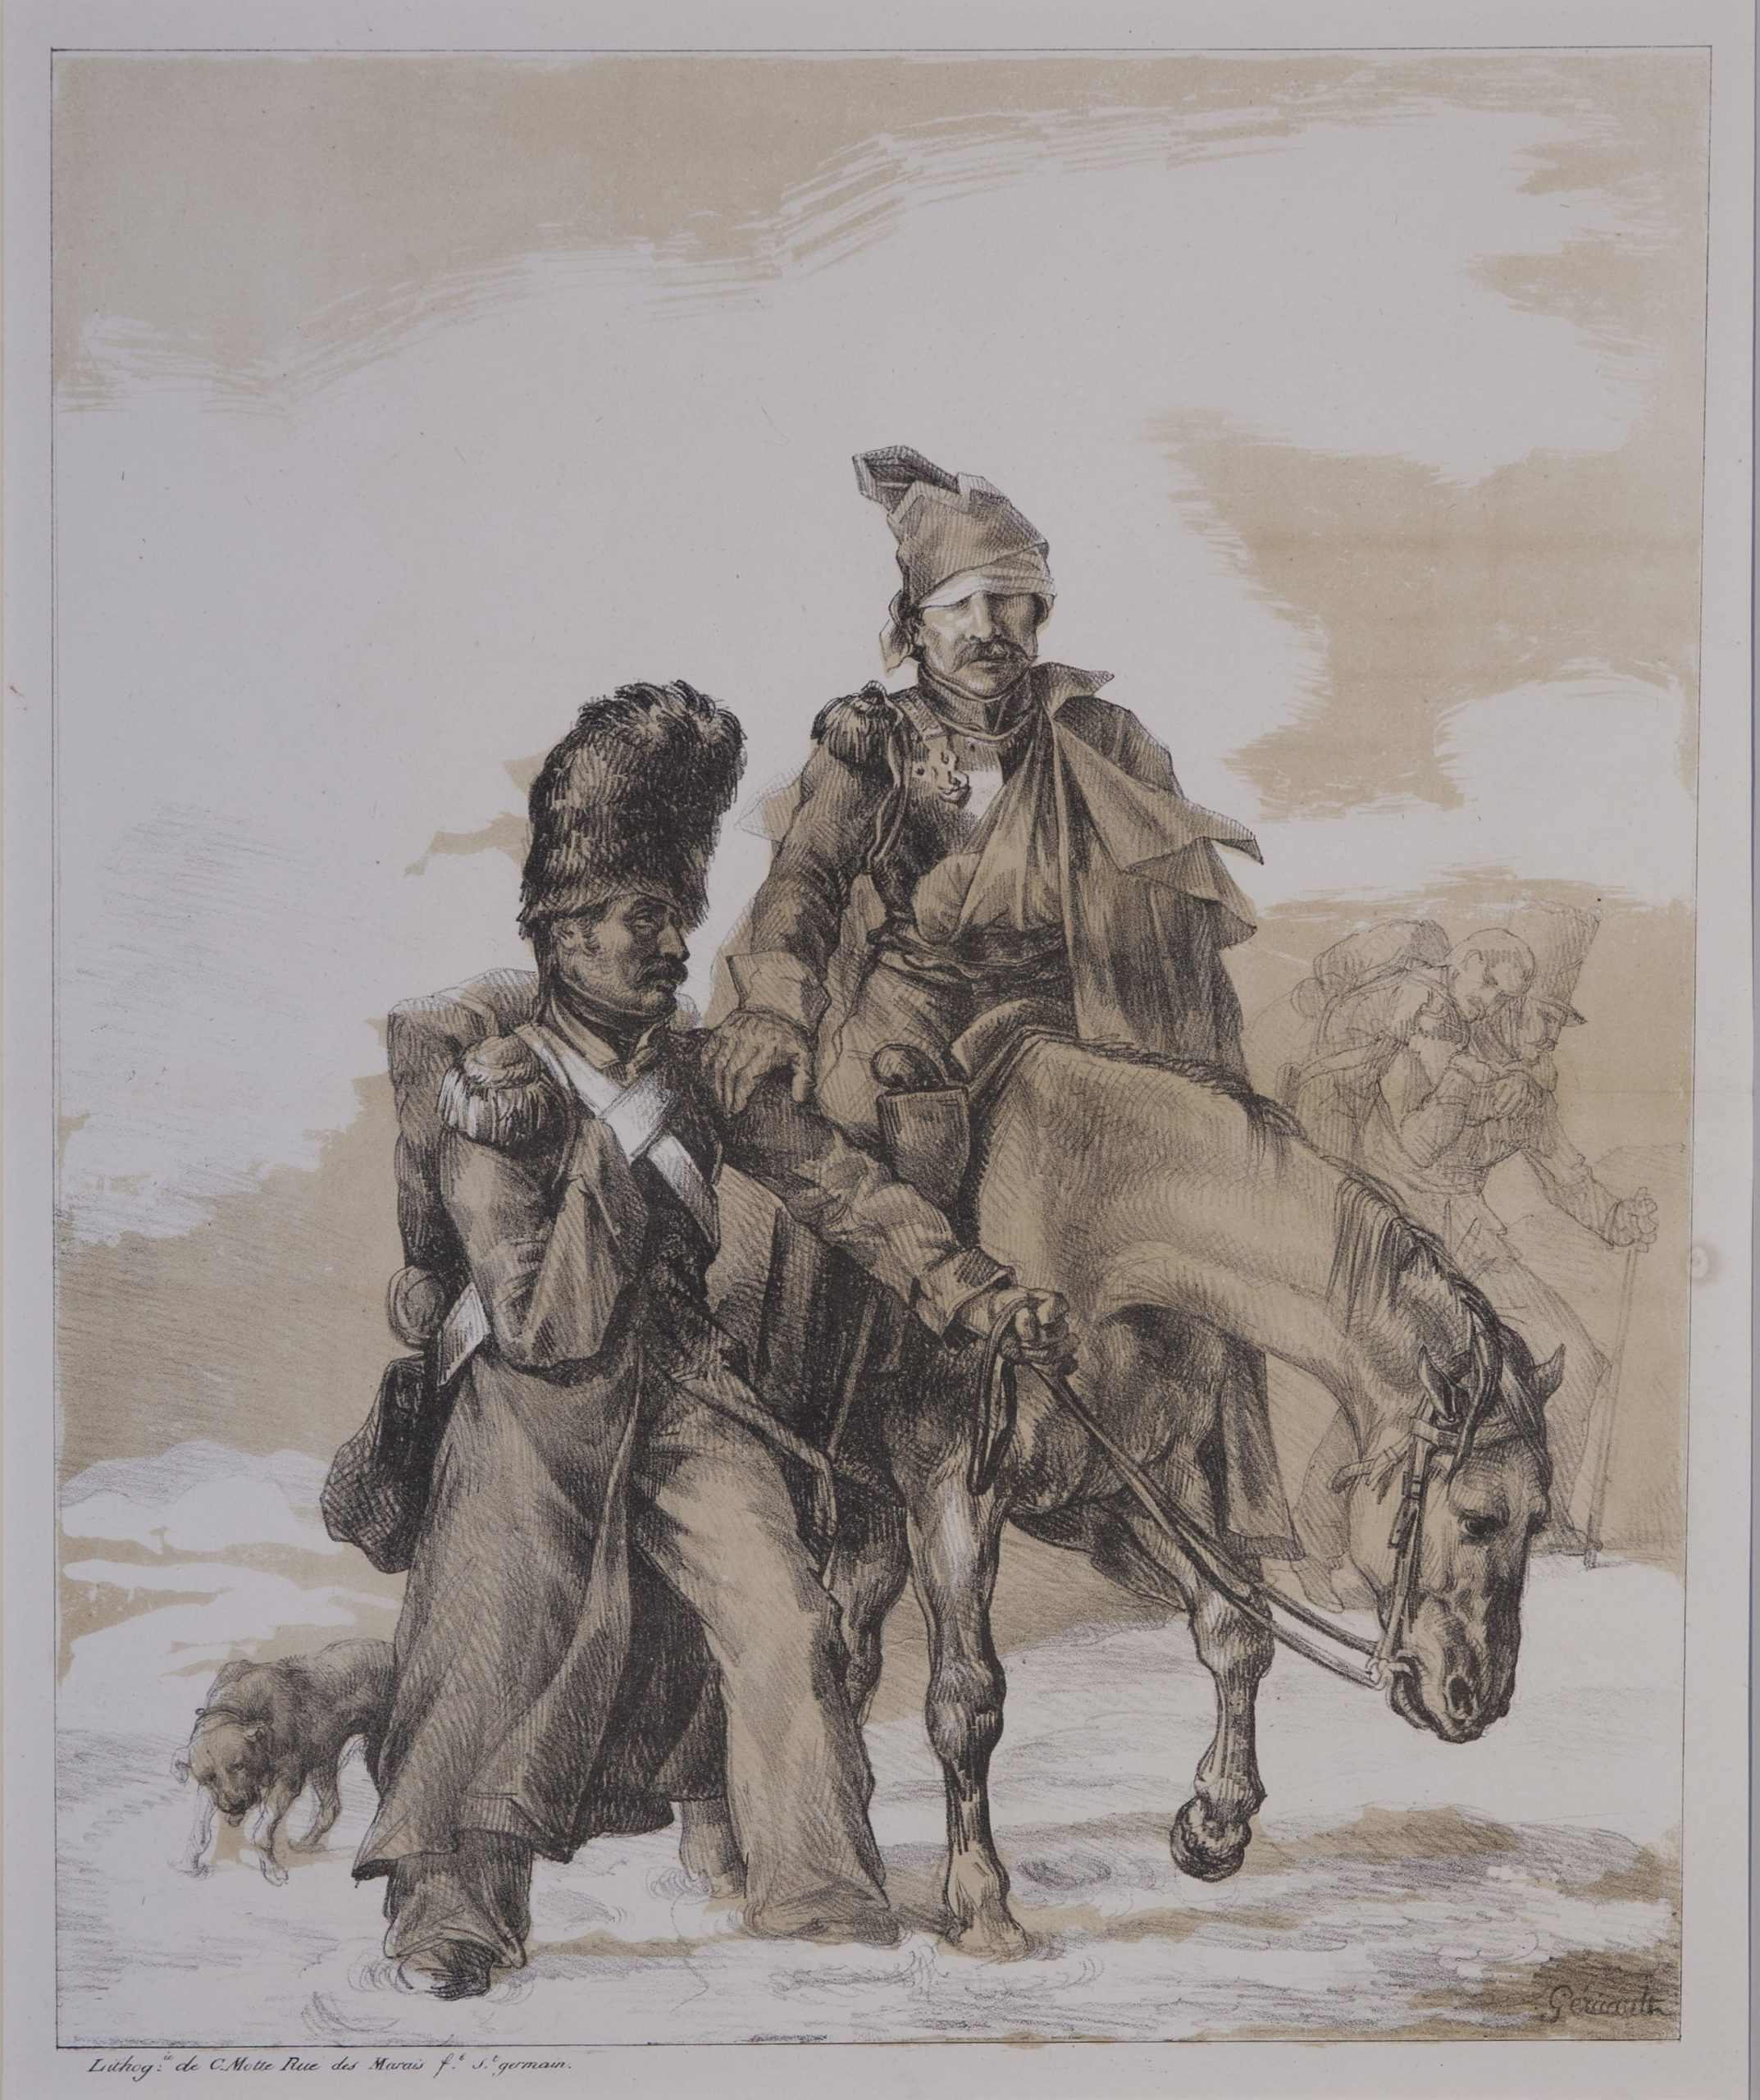 Retour de Russie [The Return from Russia] by Théodore Géricault